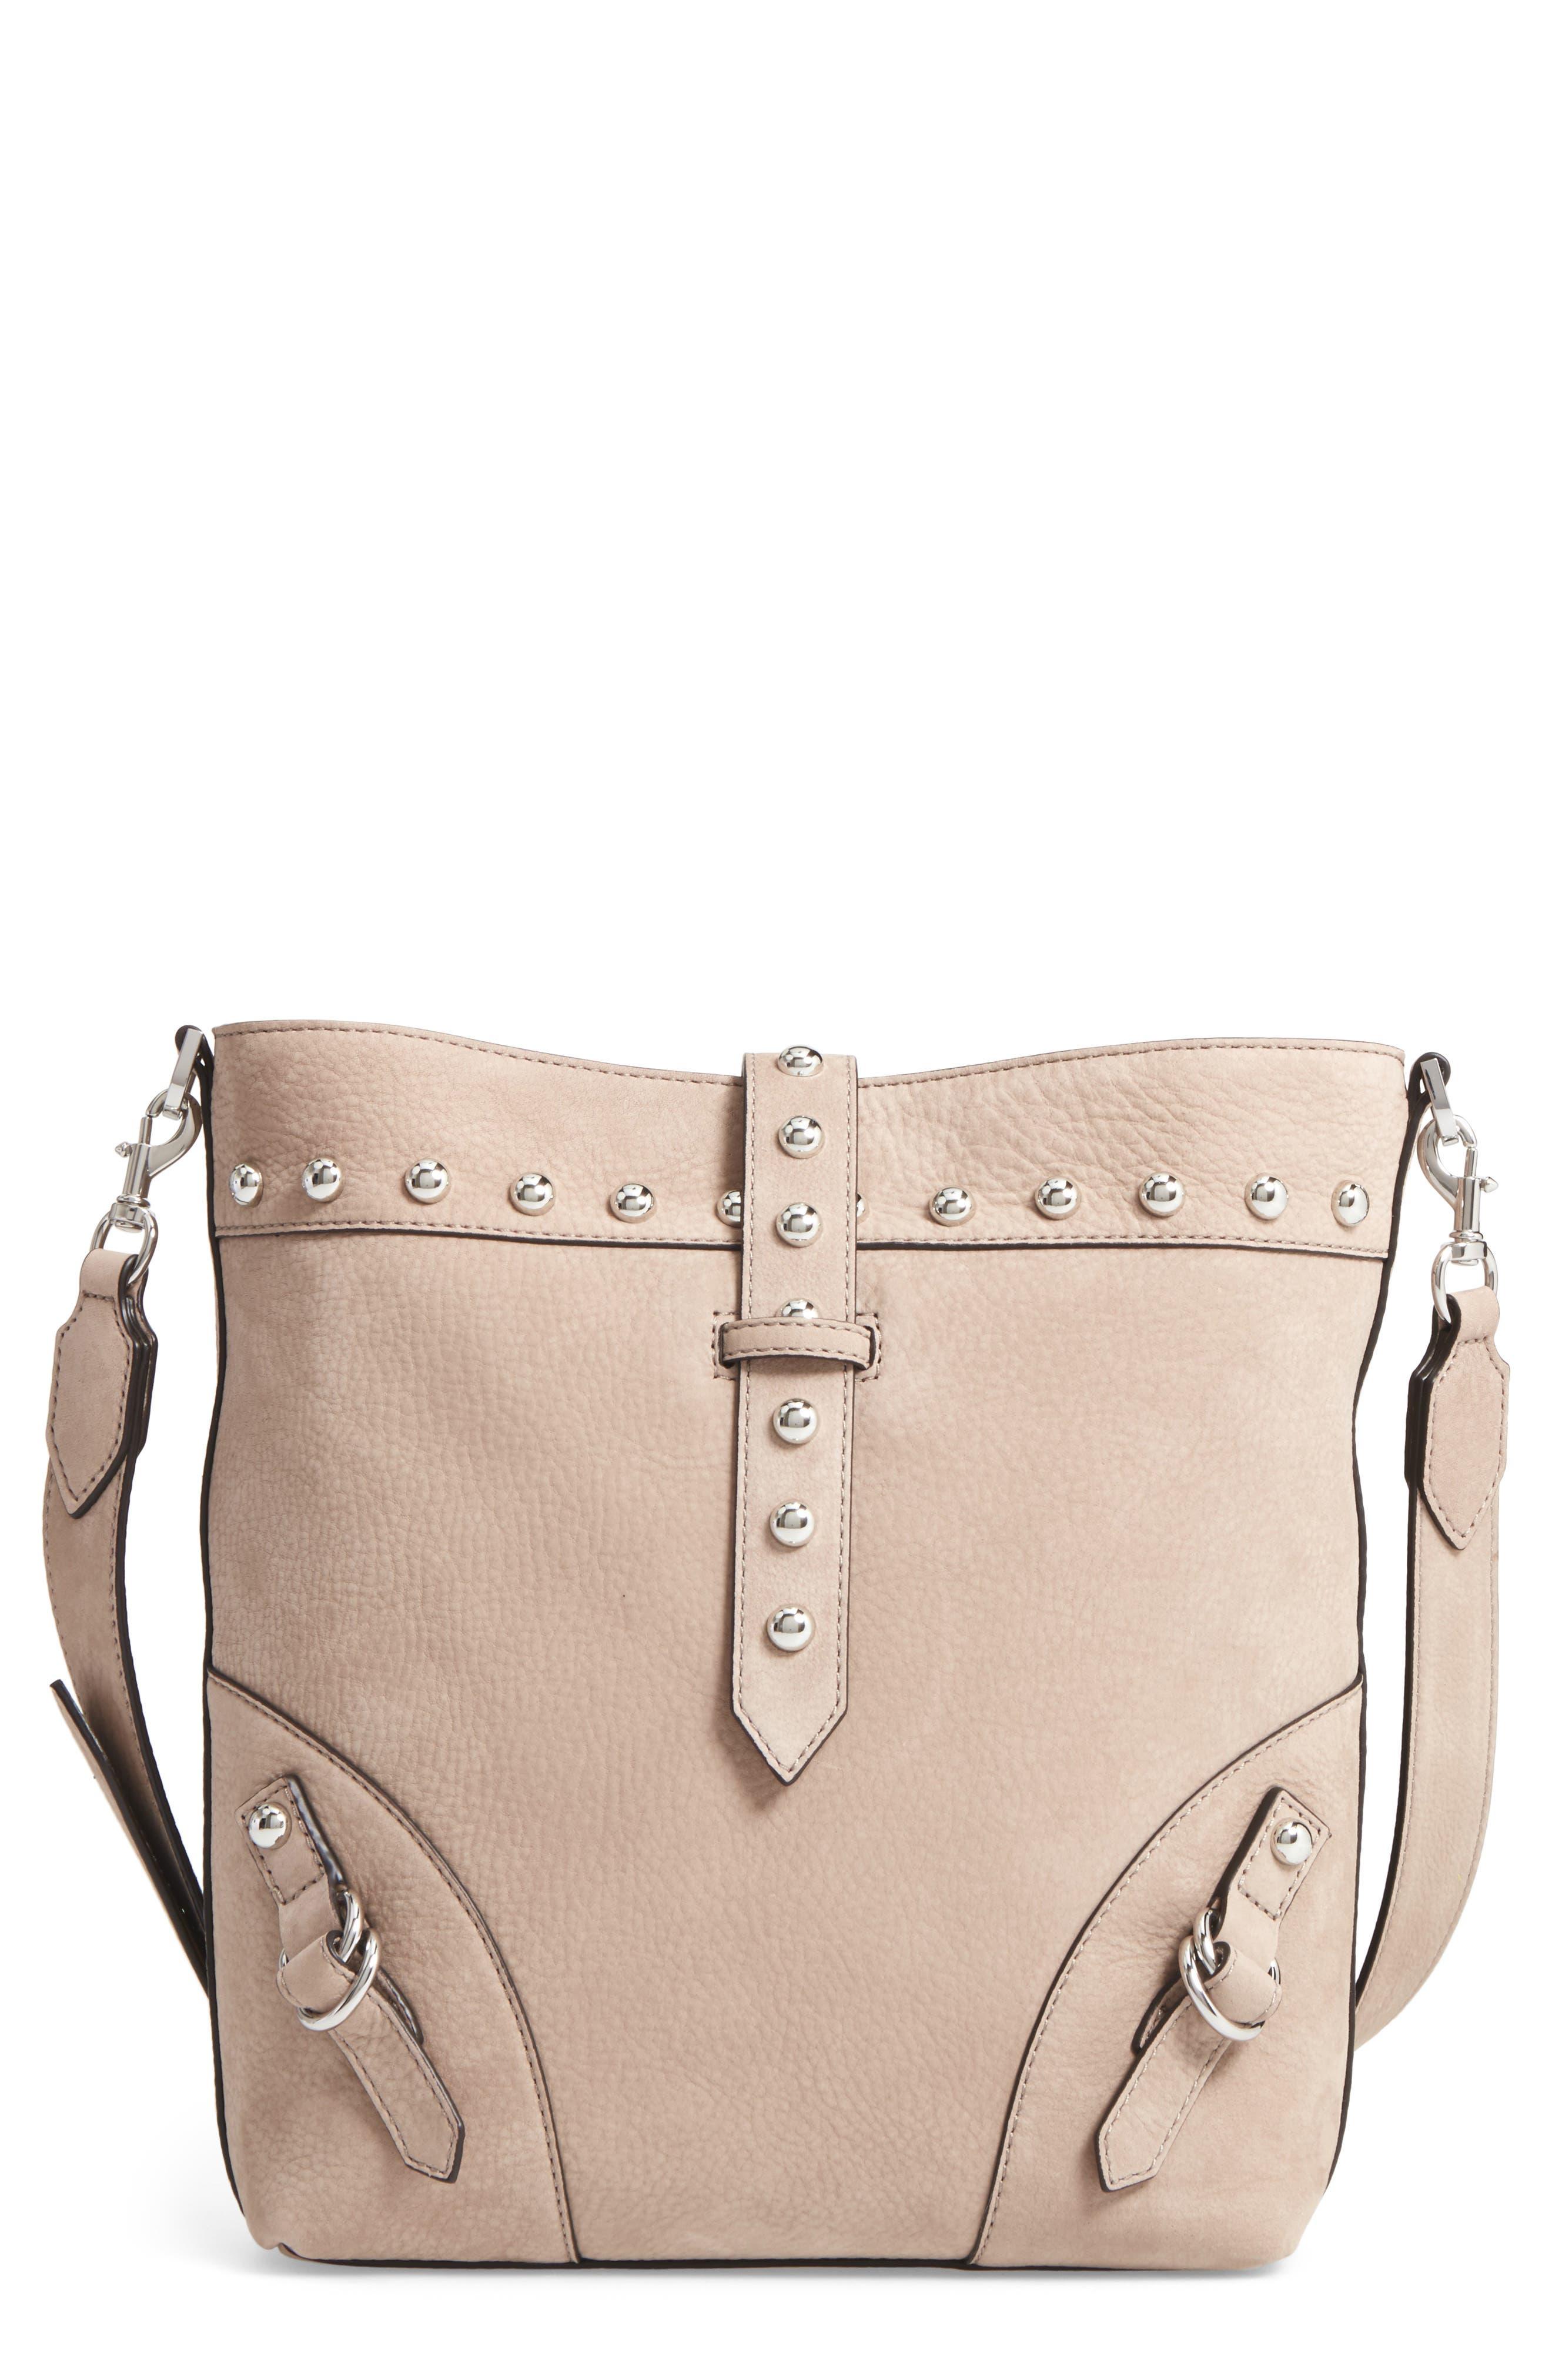 Main Image - Rebecca Minkoff Rose Leather Bucket Bag